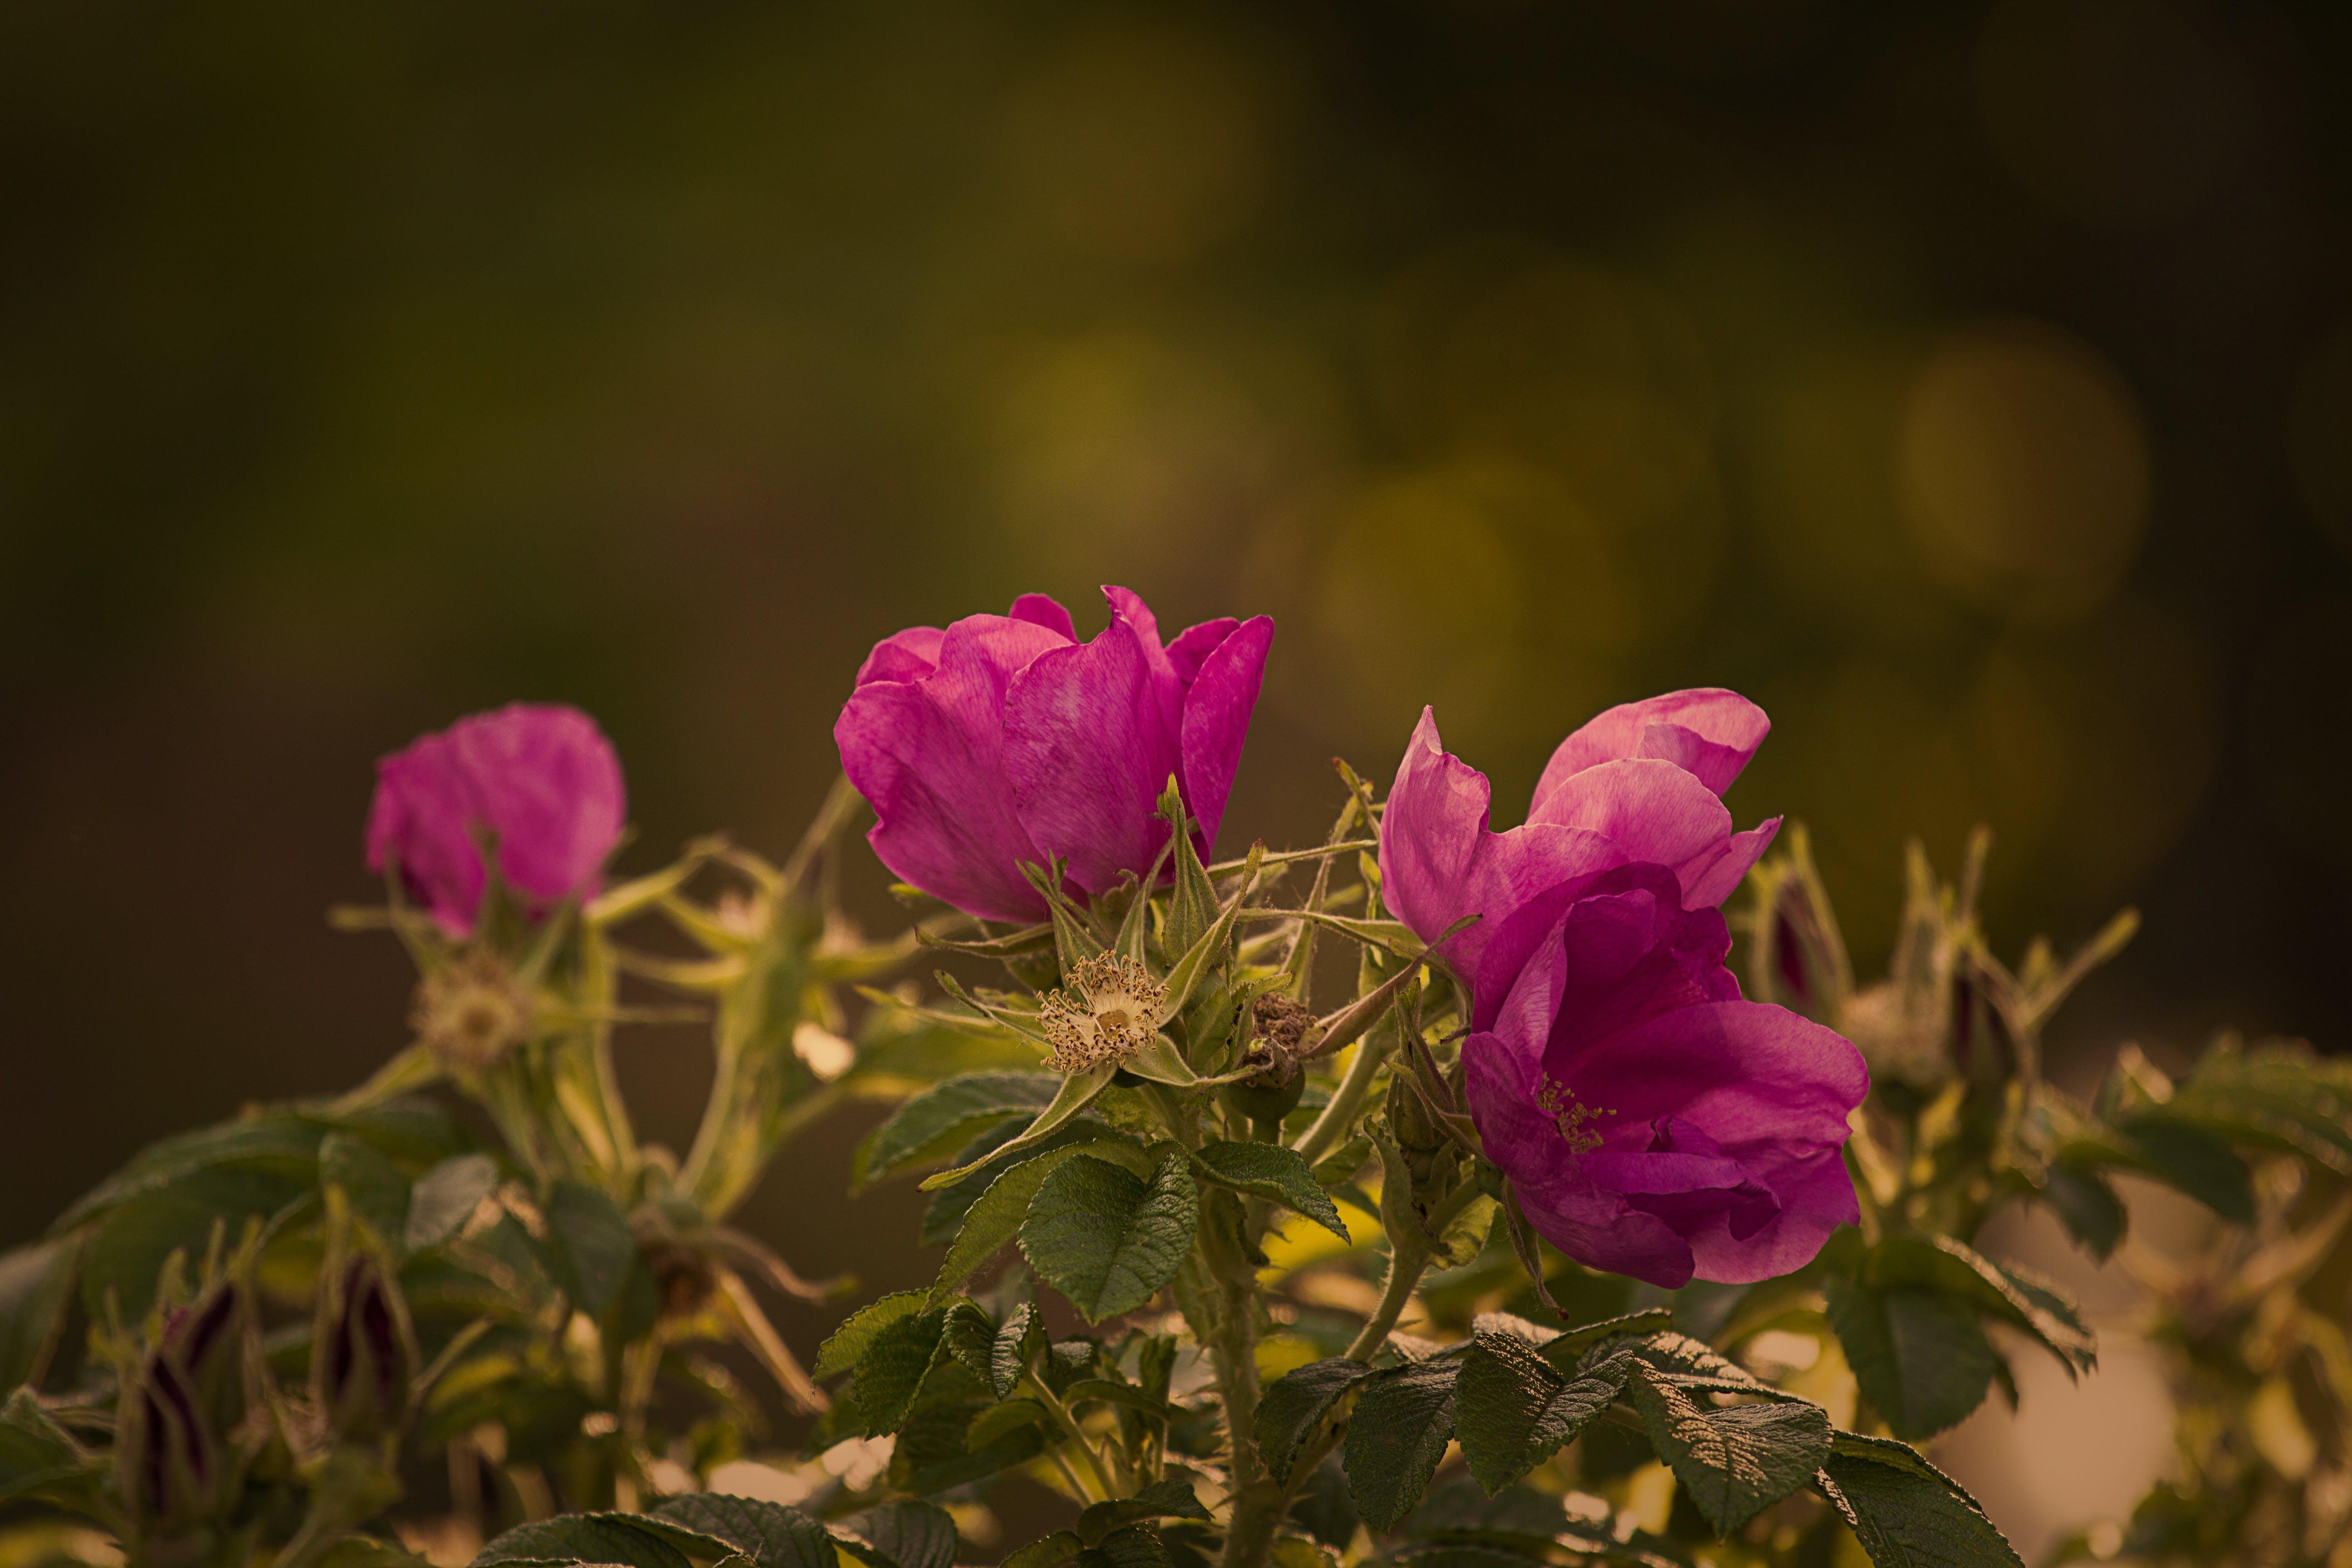 bloom, blossom, rosebush